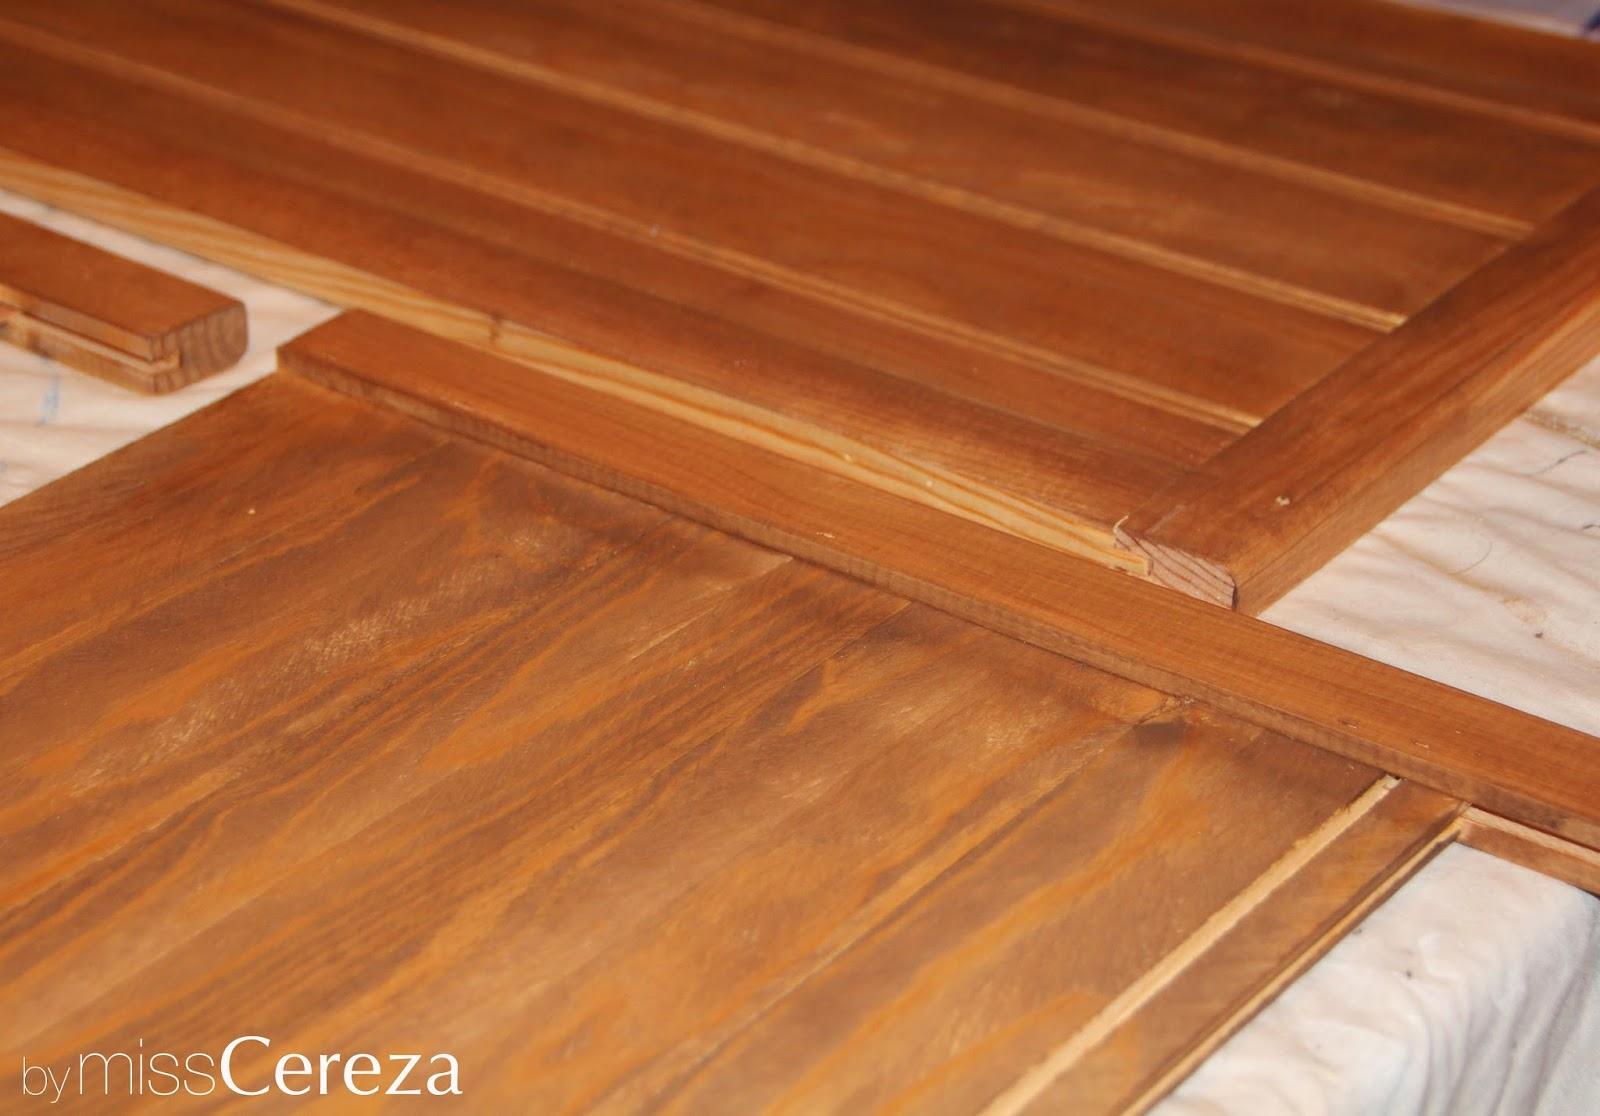 barnizando baúl de madera